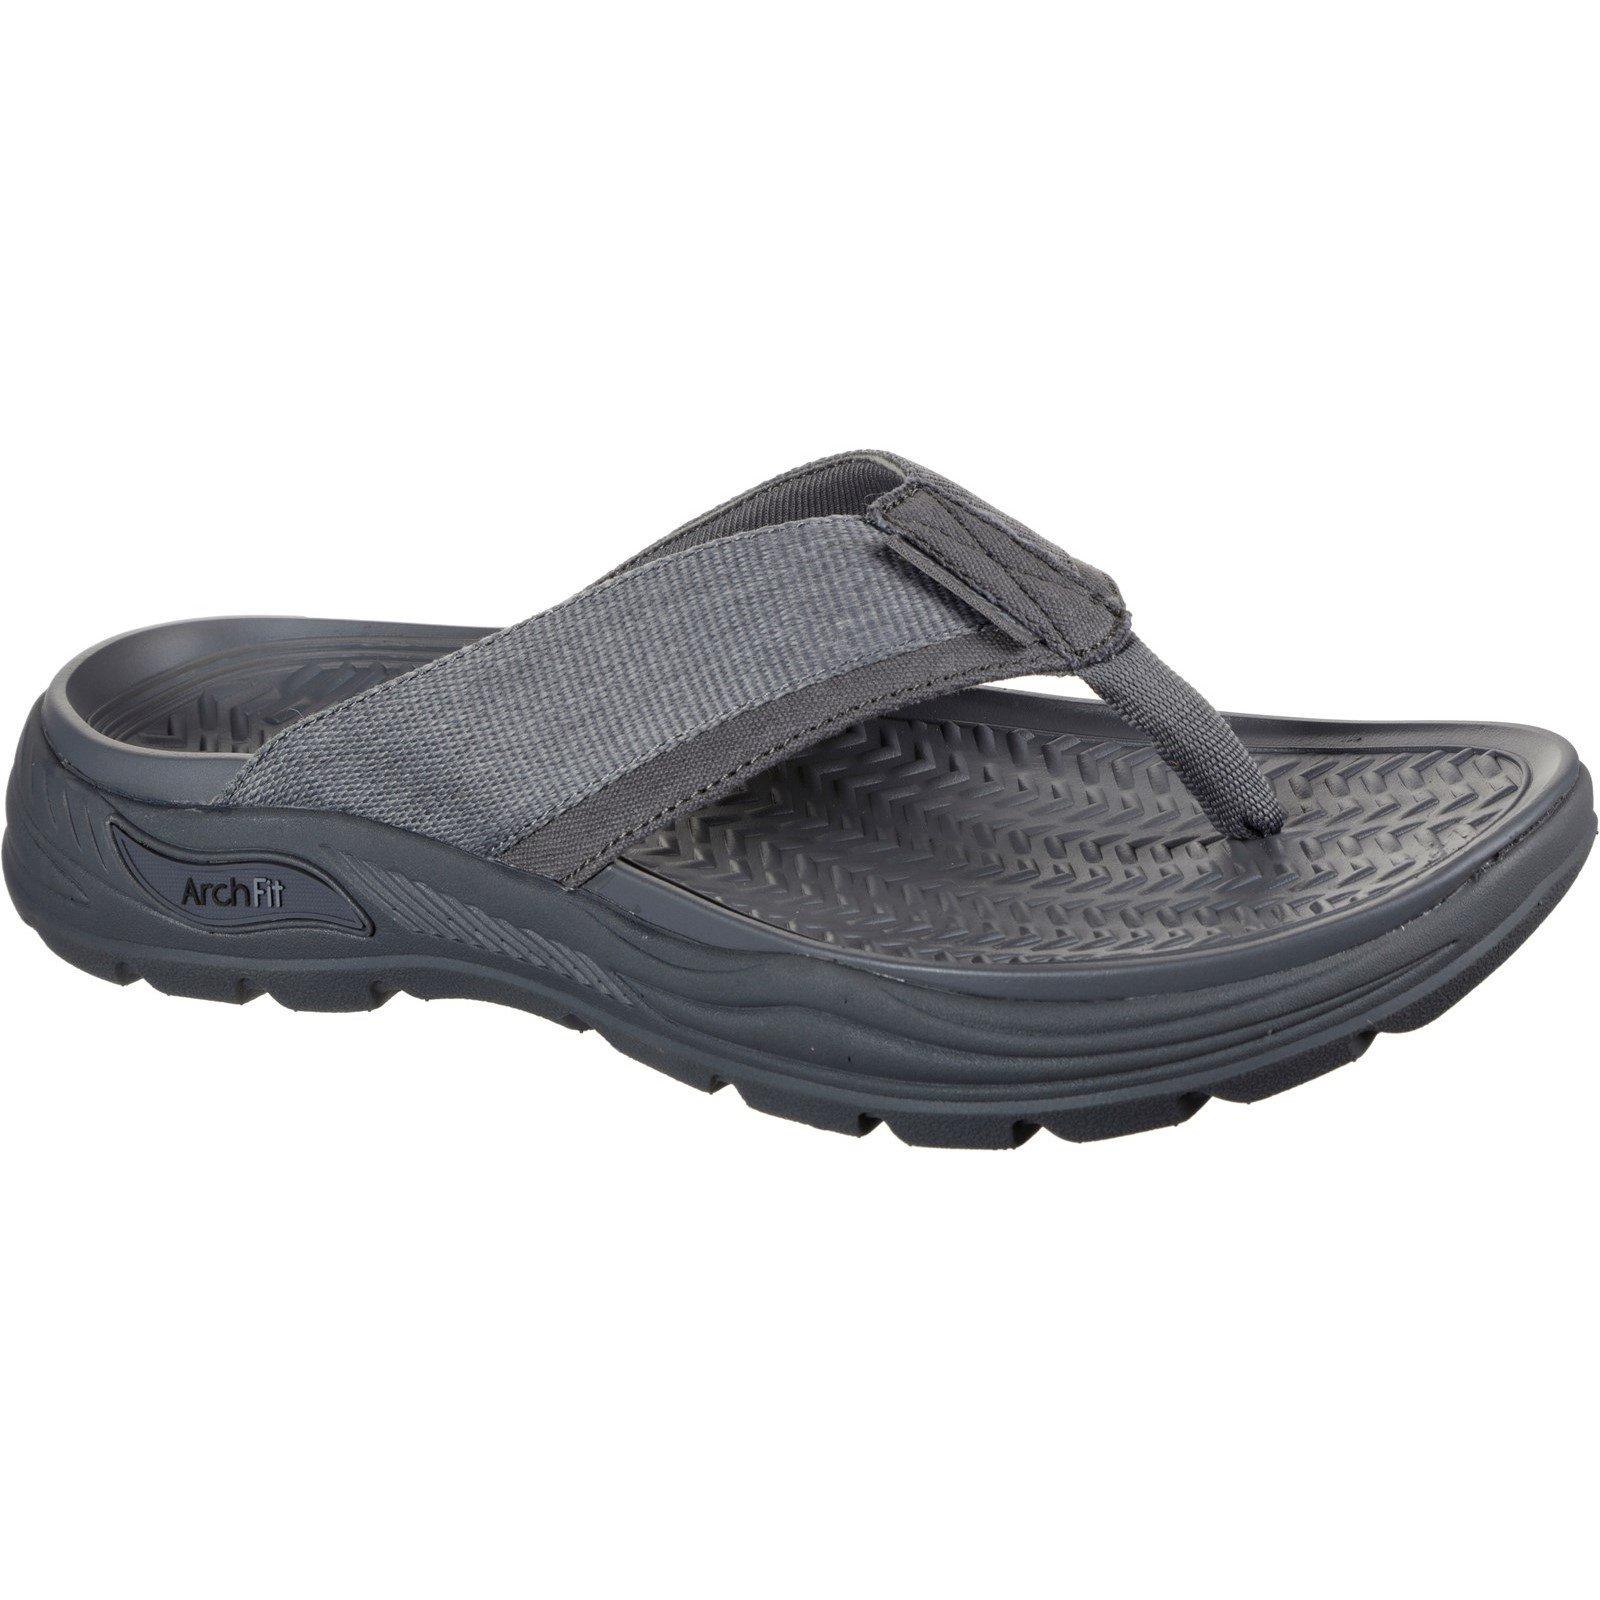 Skechers Men's Arch Fit Motley Dolano Summer Sandal Charcoal 32209 - Charcoal 10